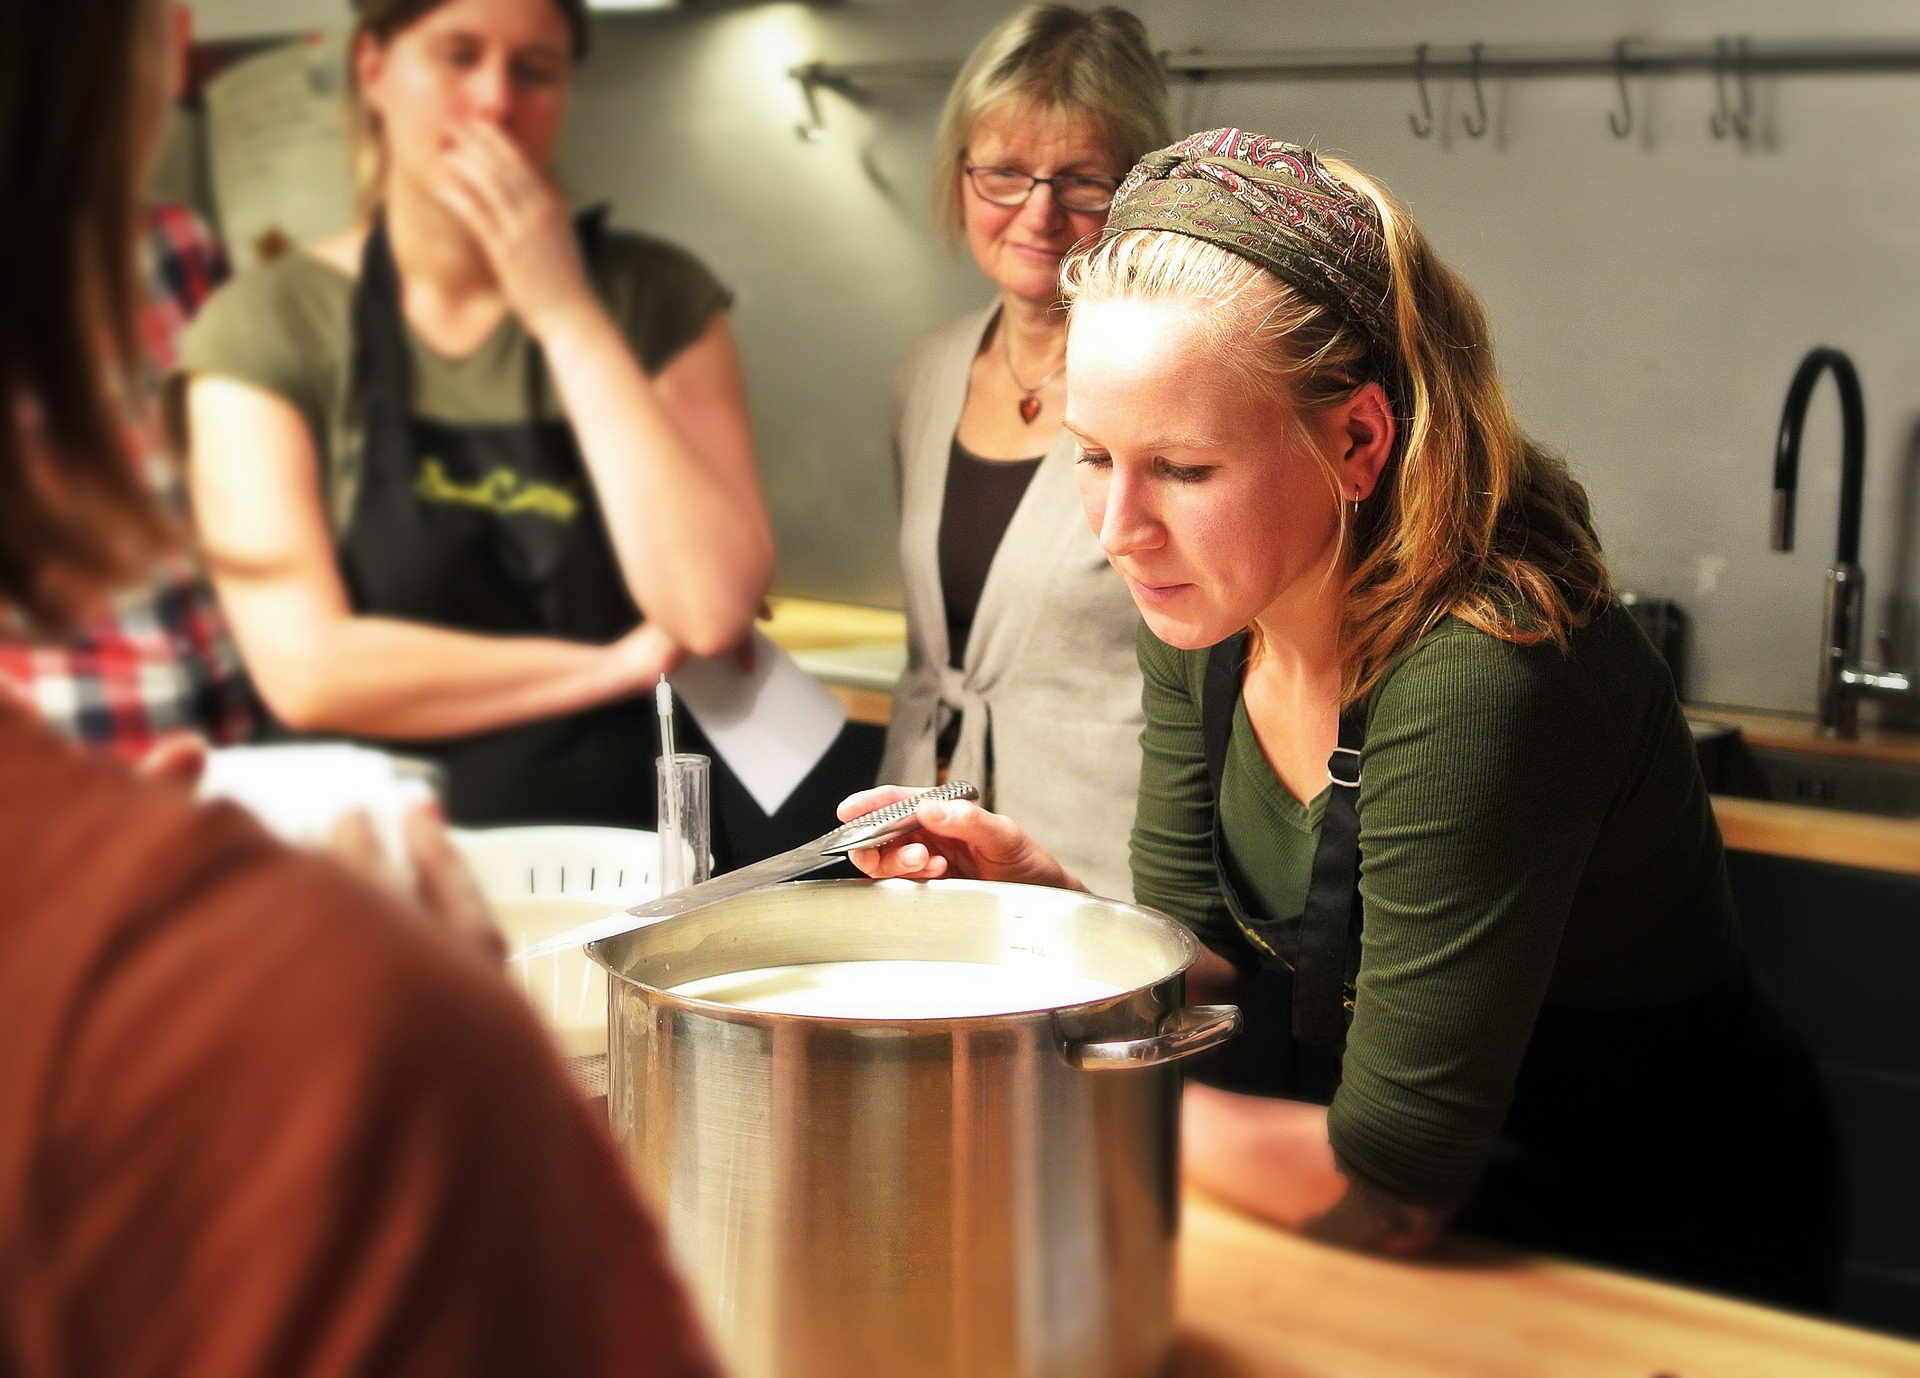 Kochtopf-Theorie und der Kochtopf-Test – ist der Kochtopf (noch) gut?